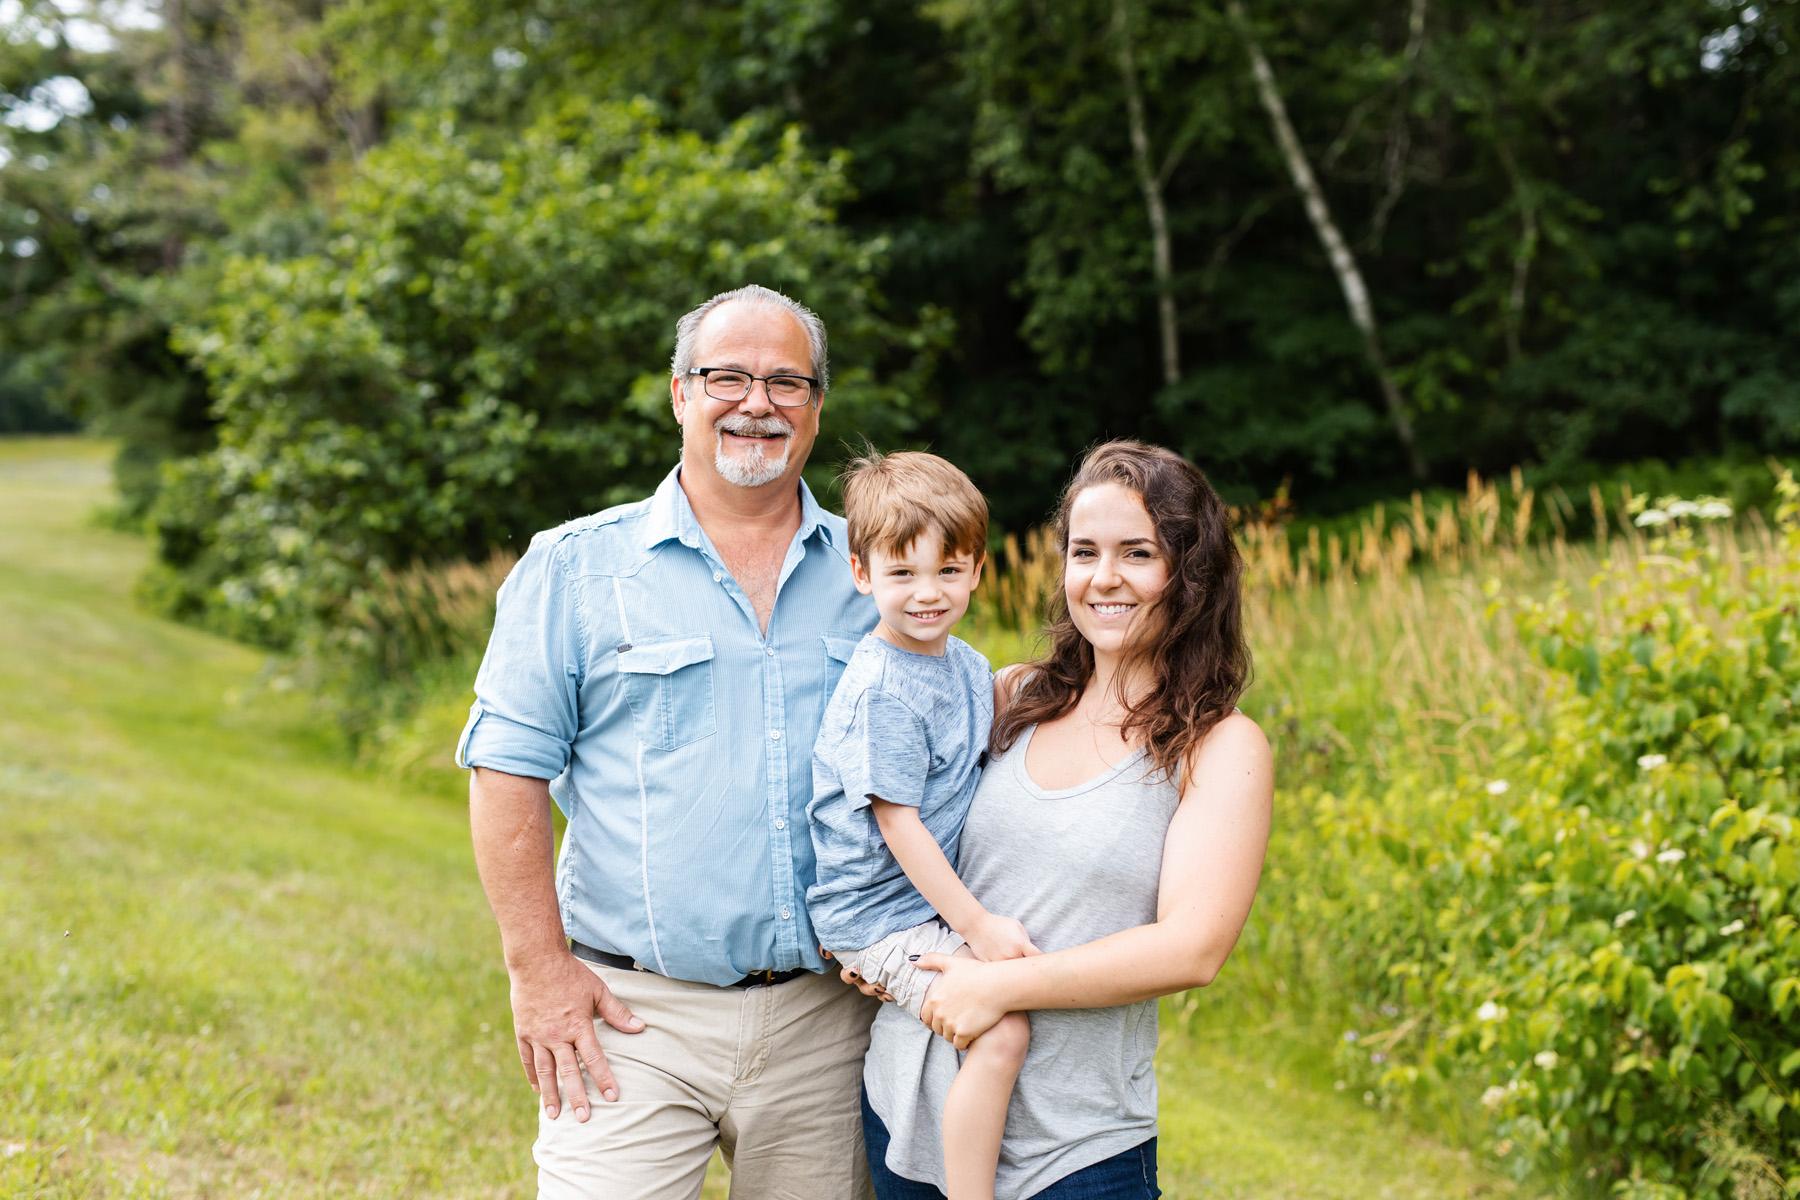 Family photos belchertown massachusetts